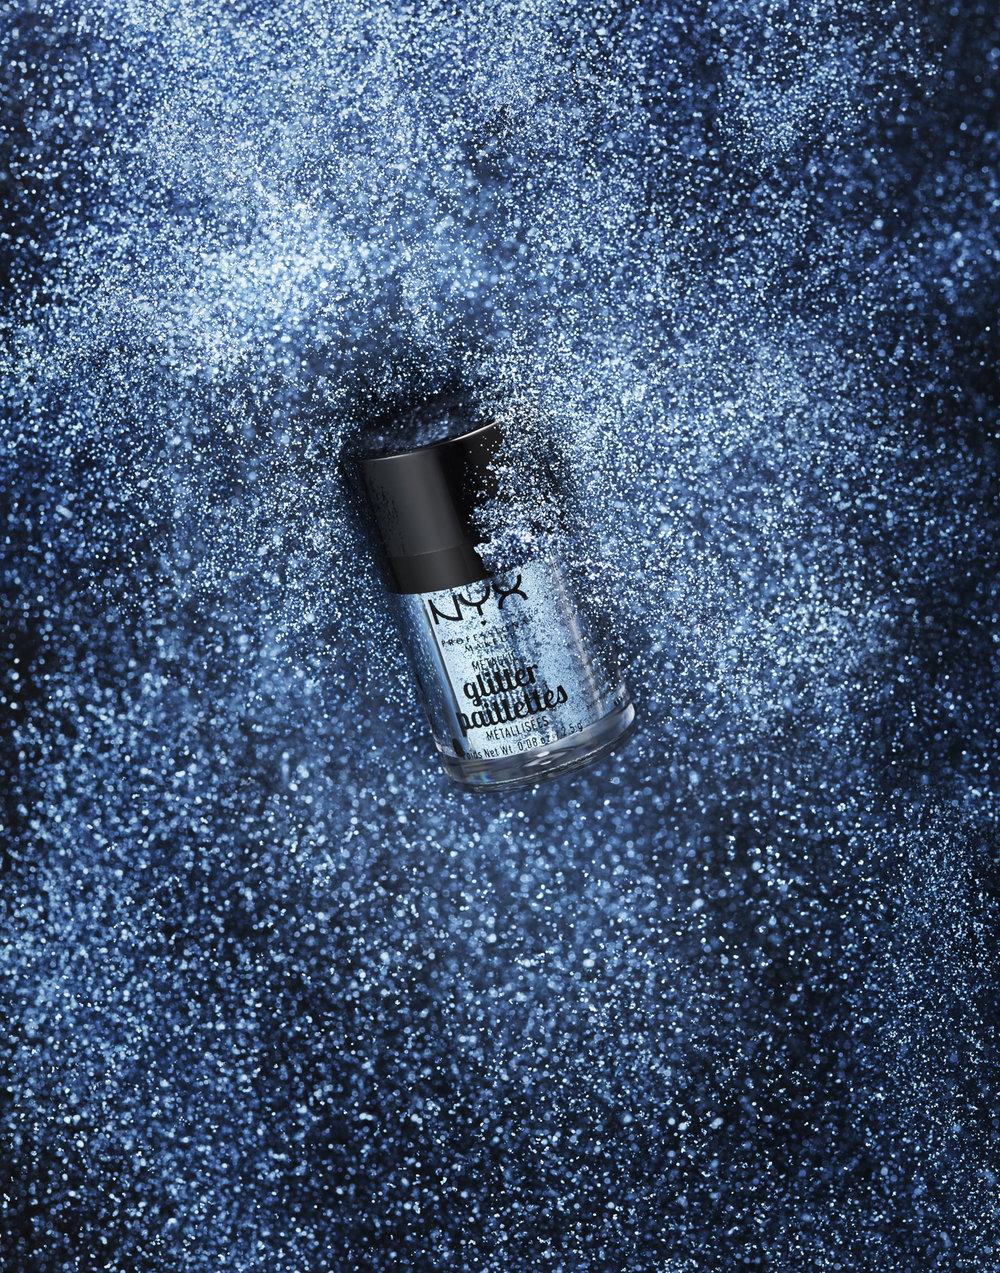 170830 Nyx Black Glitter.jpg